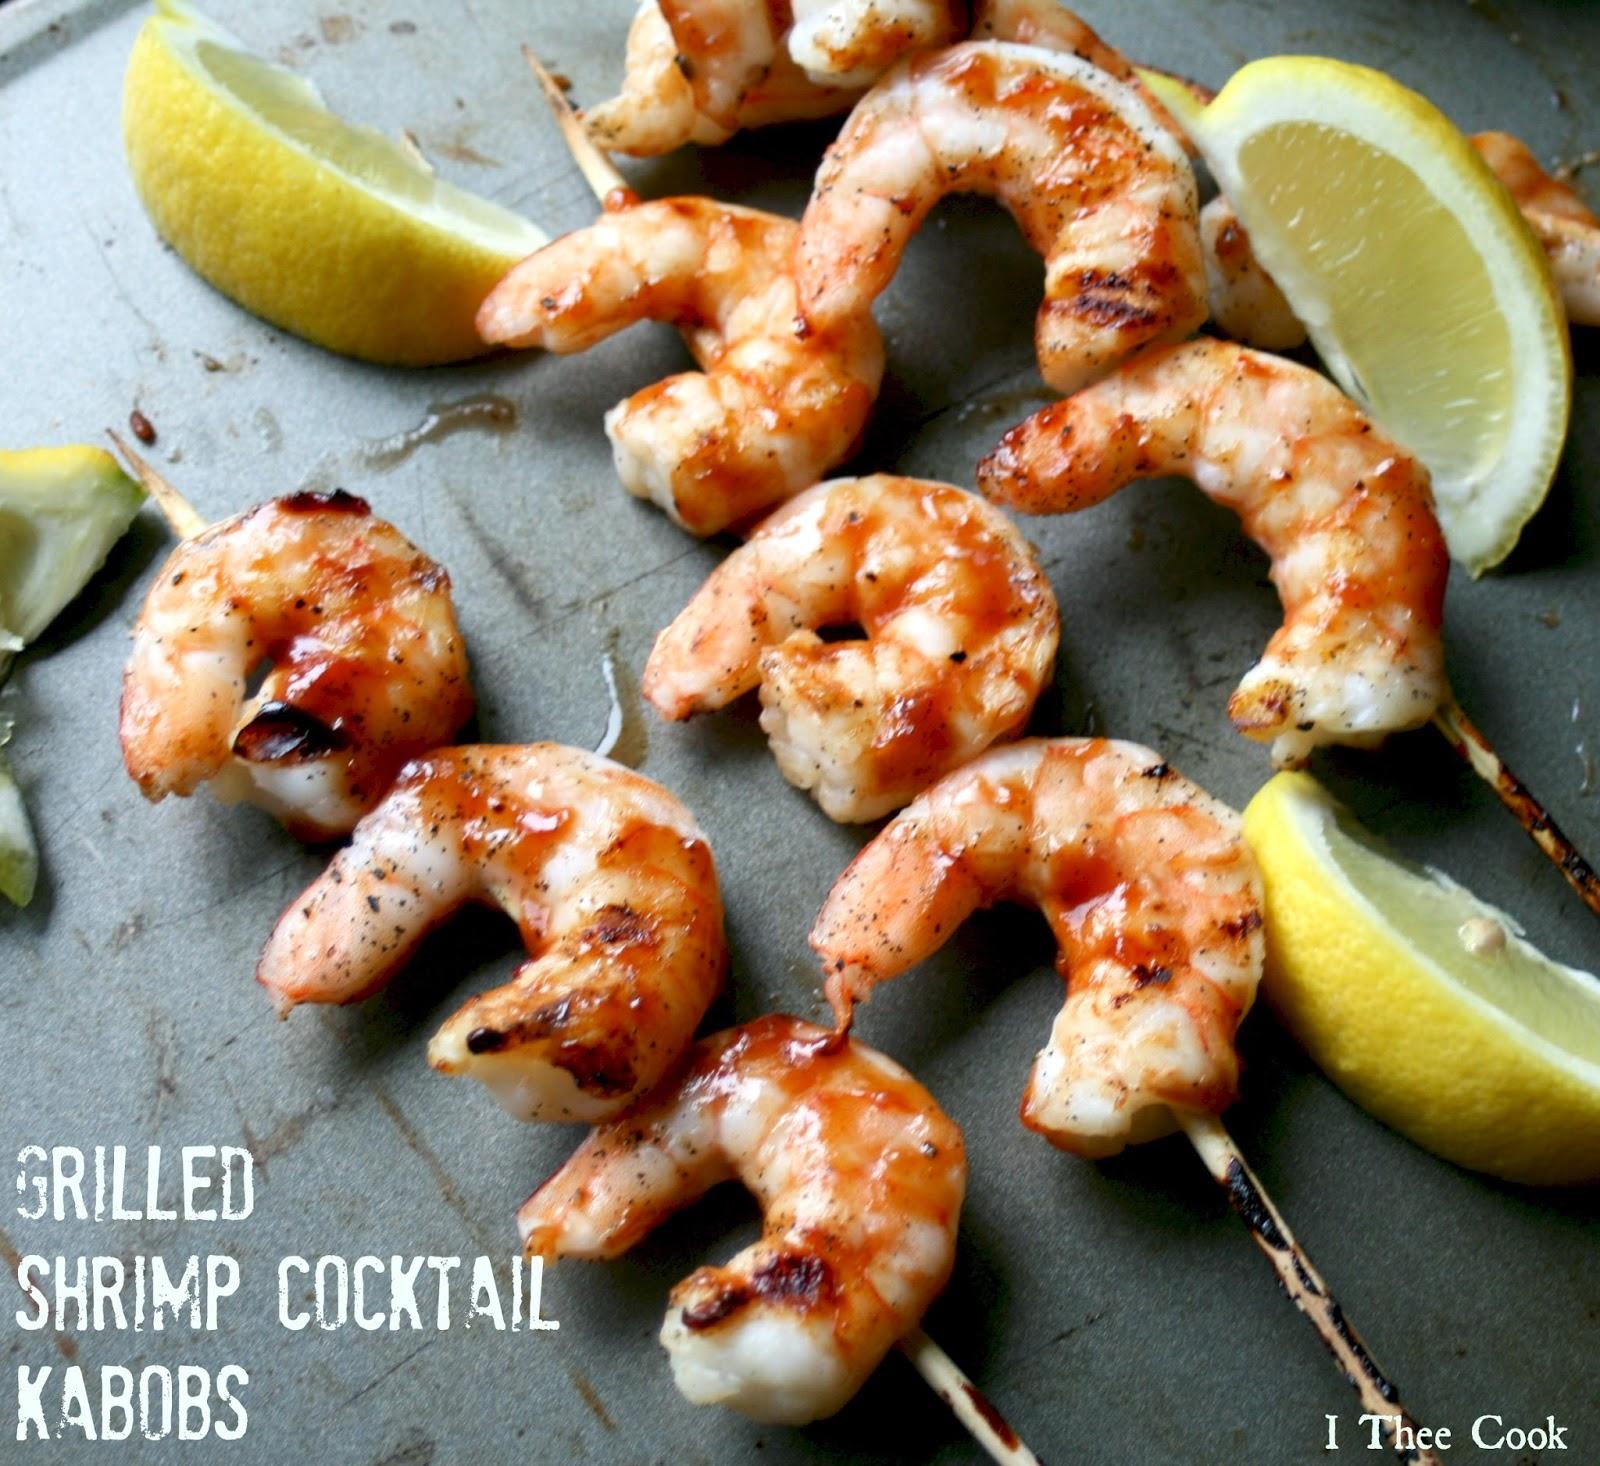 I Thee Cook: Grilled Shrimp Cocktail Kabobs